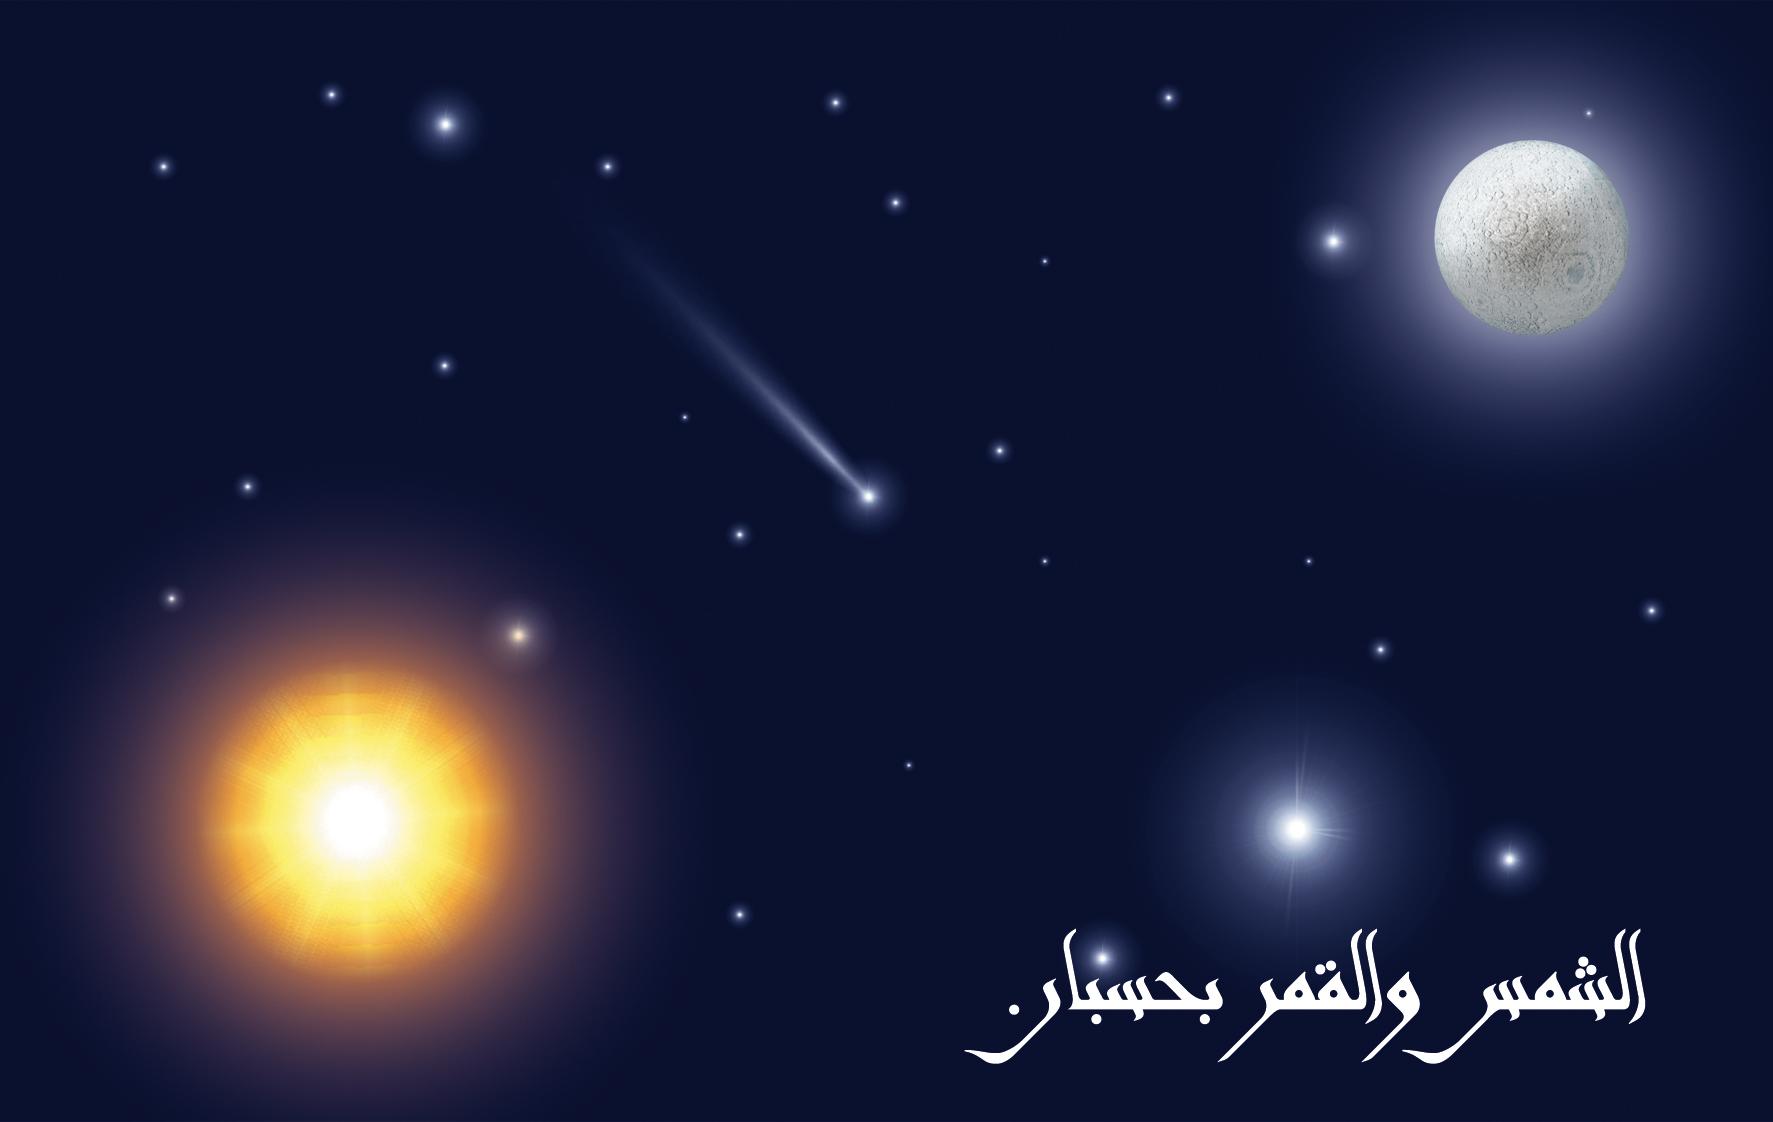 worksheet Sun And Stars similiar moon sun stars keywords by ahmedtelb on deviantart